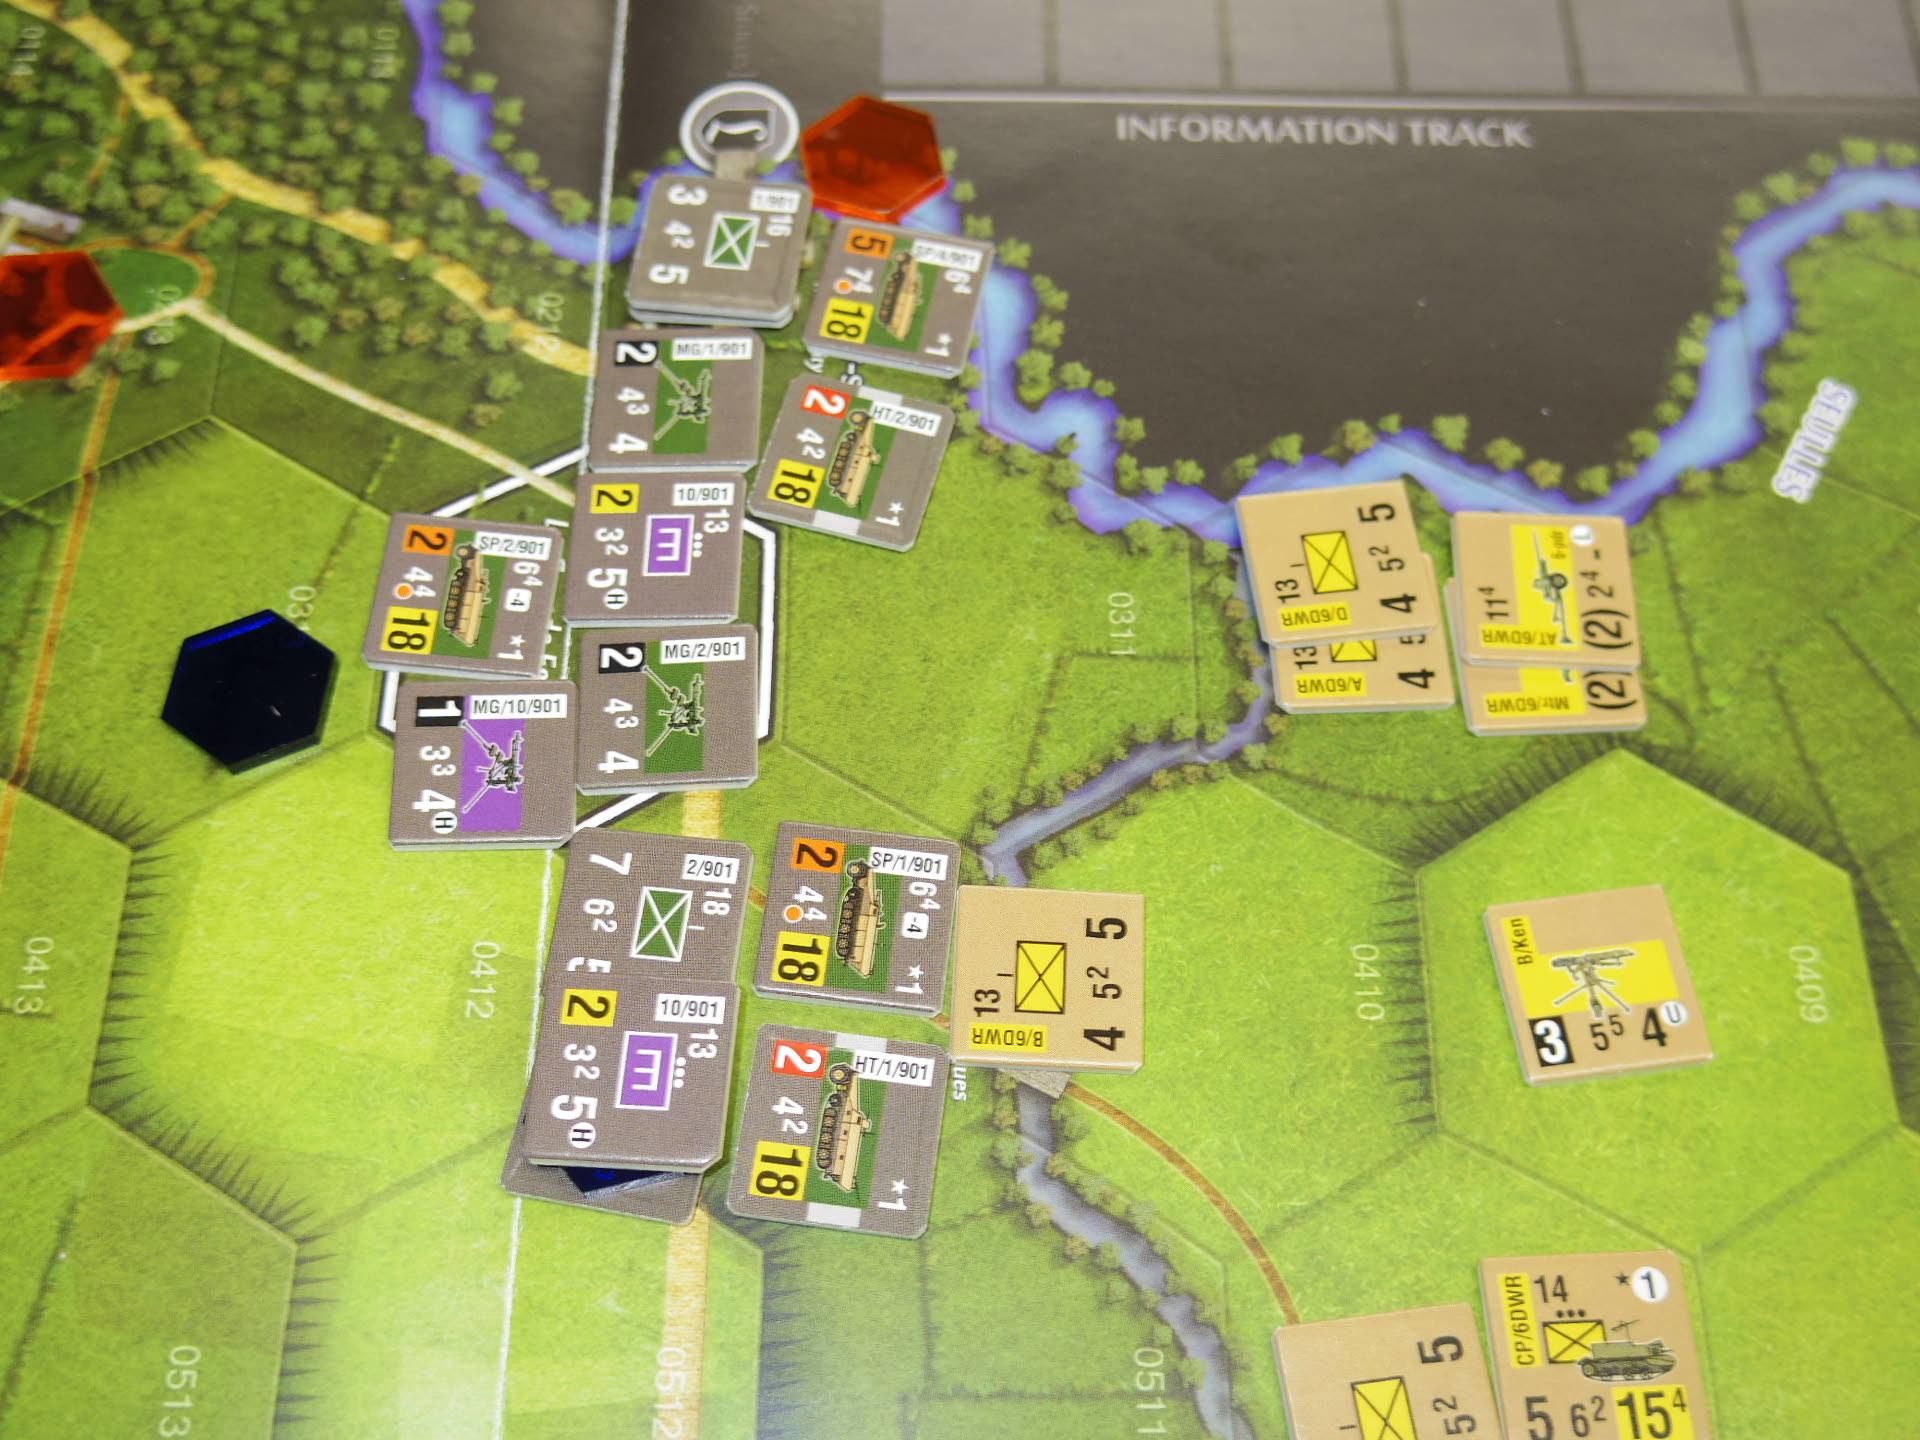 YSGA第332回定例会の様子その5(GMT)Operation Dauntless普及第1班 C3I#30掲載の追加シナリオも含めシナリオ3連戦を満喫)_b0173672_23063417.jpg